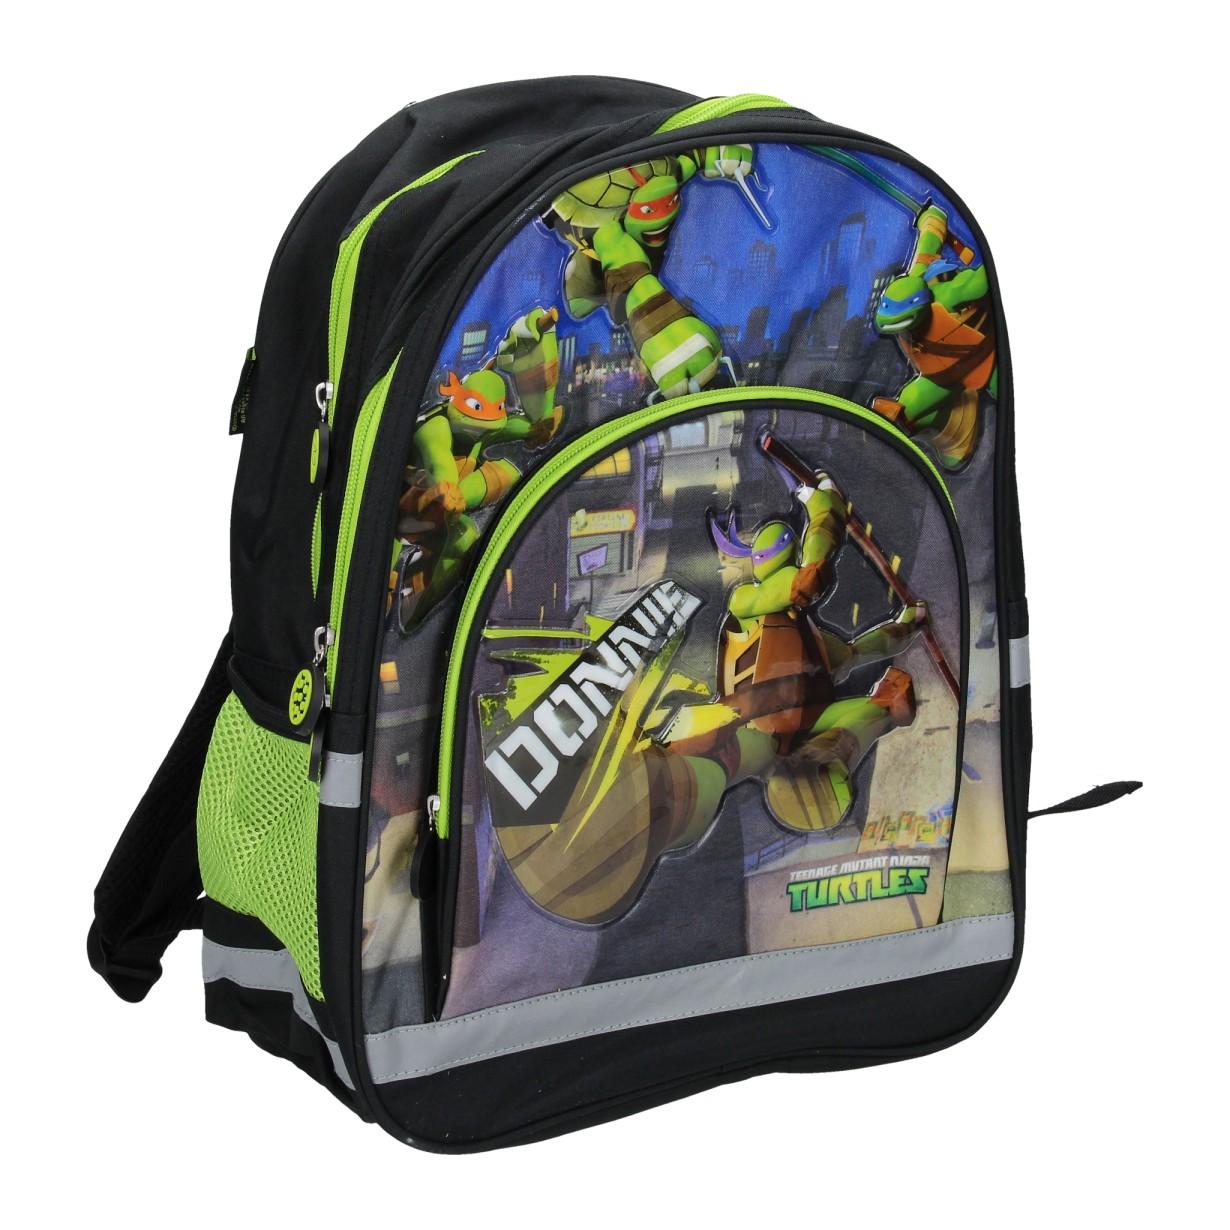 Plecak szkolny Ninja Turtles Starpack